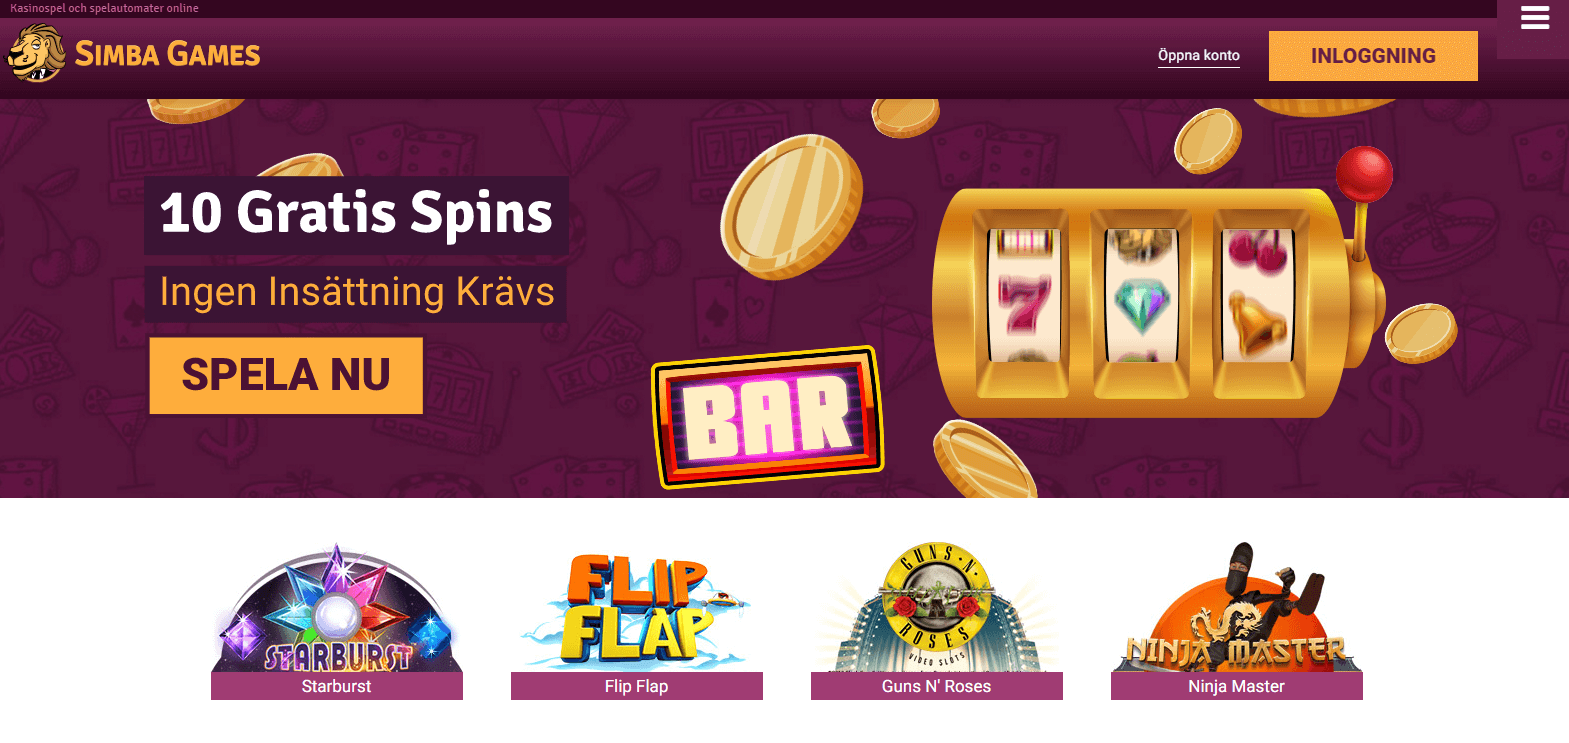 Gratis Casino Bonus Utan Insattning